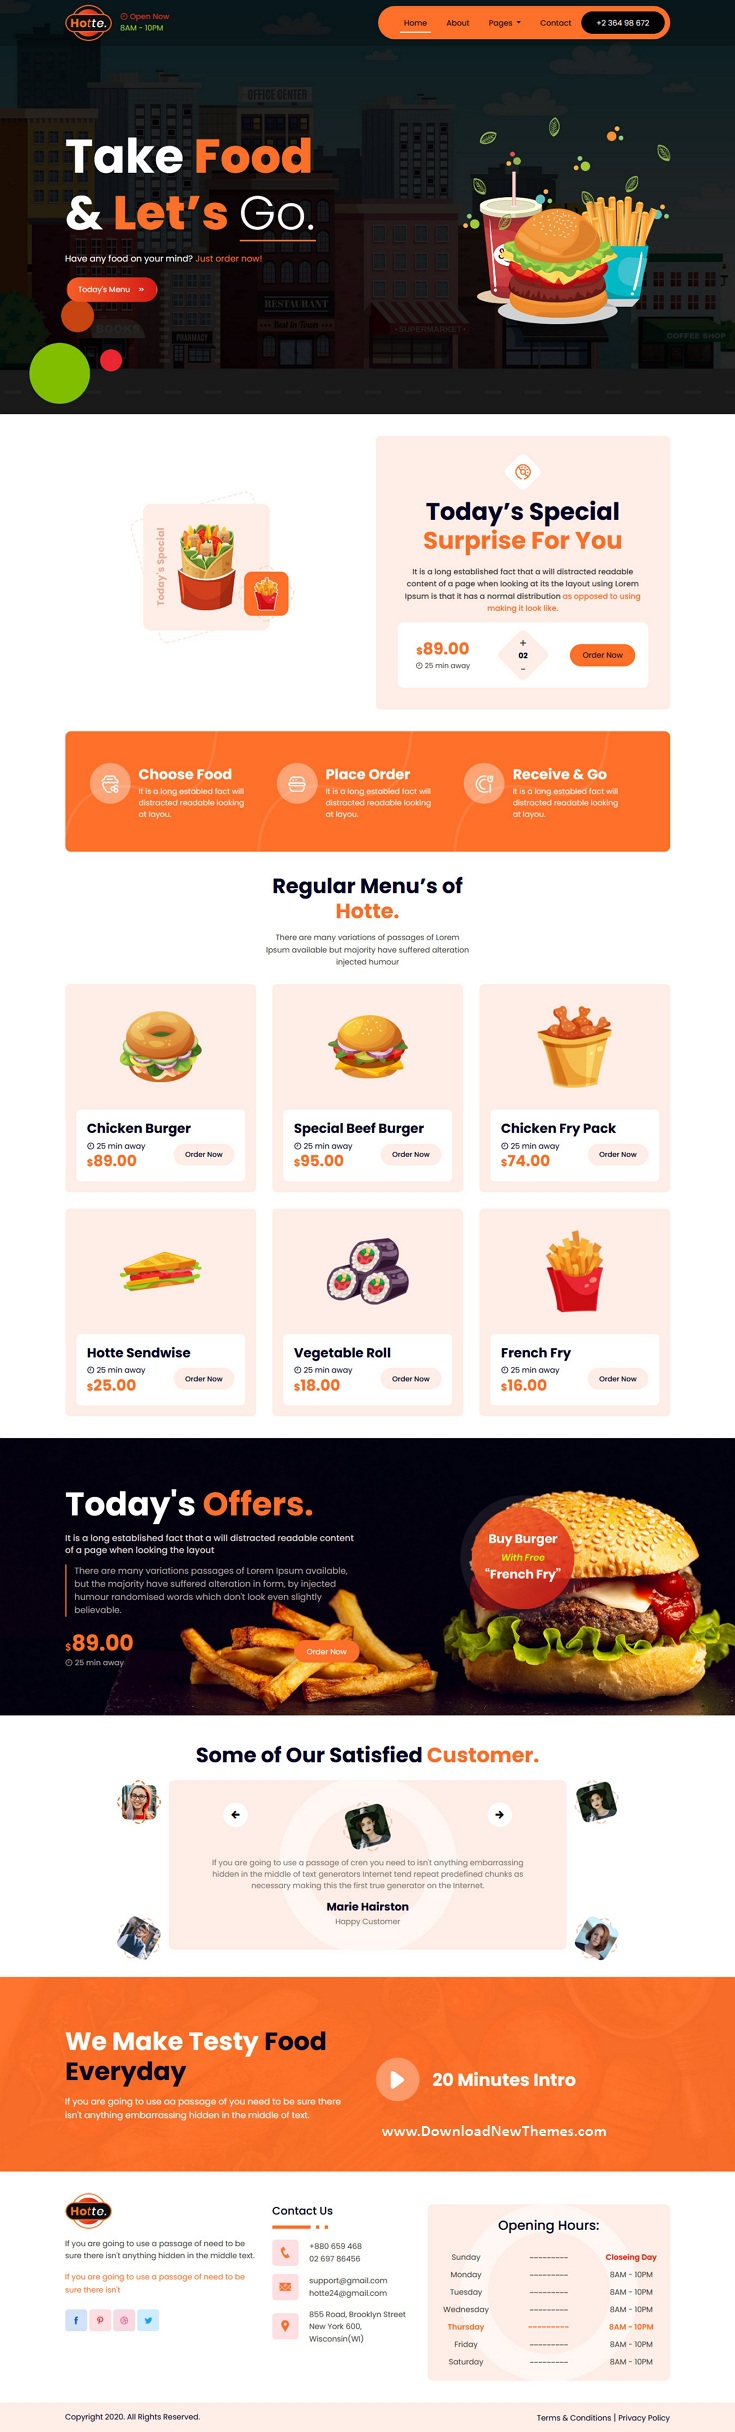 Take Away Food HTML5 Template